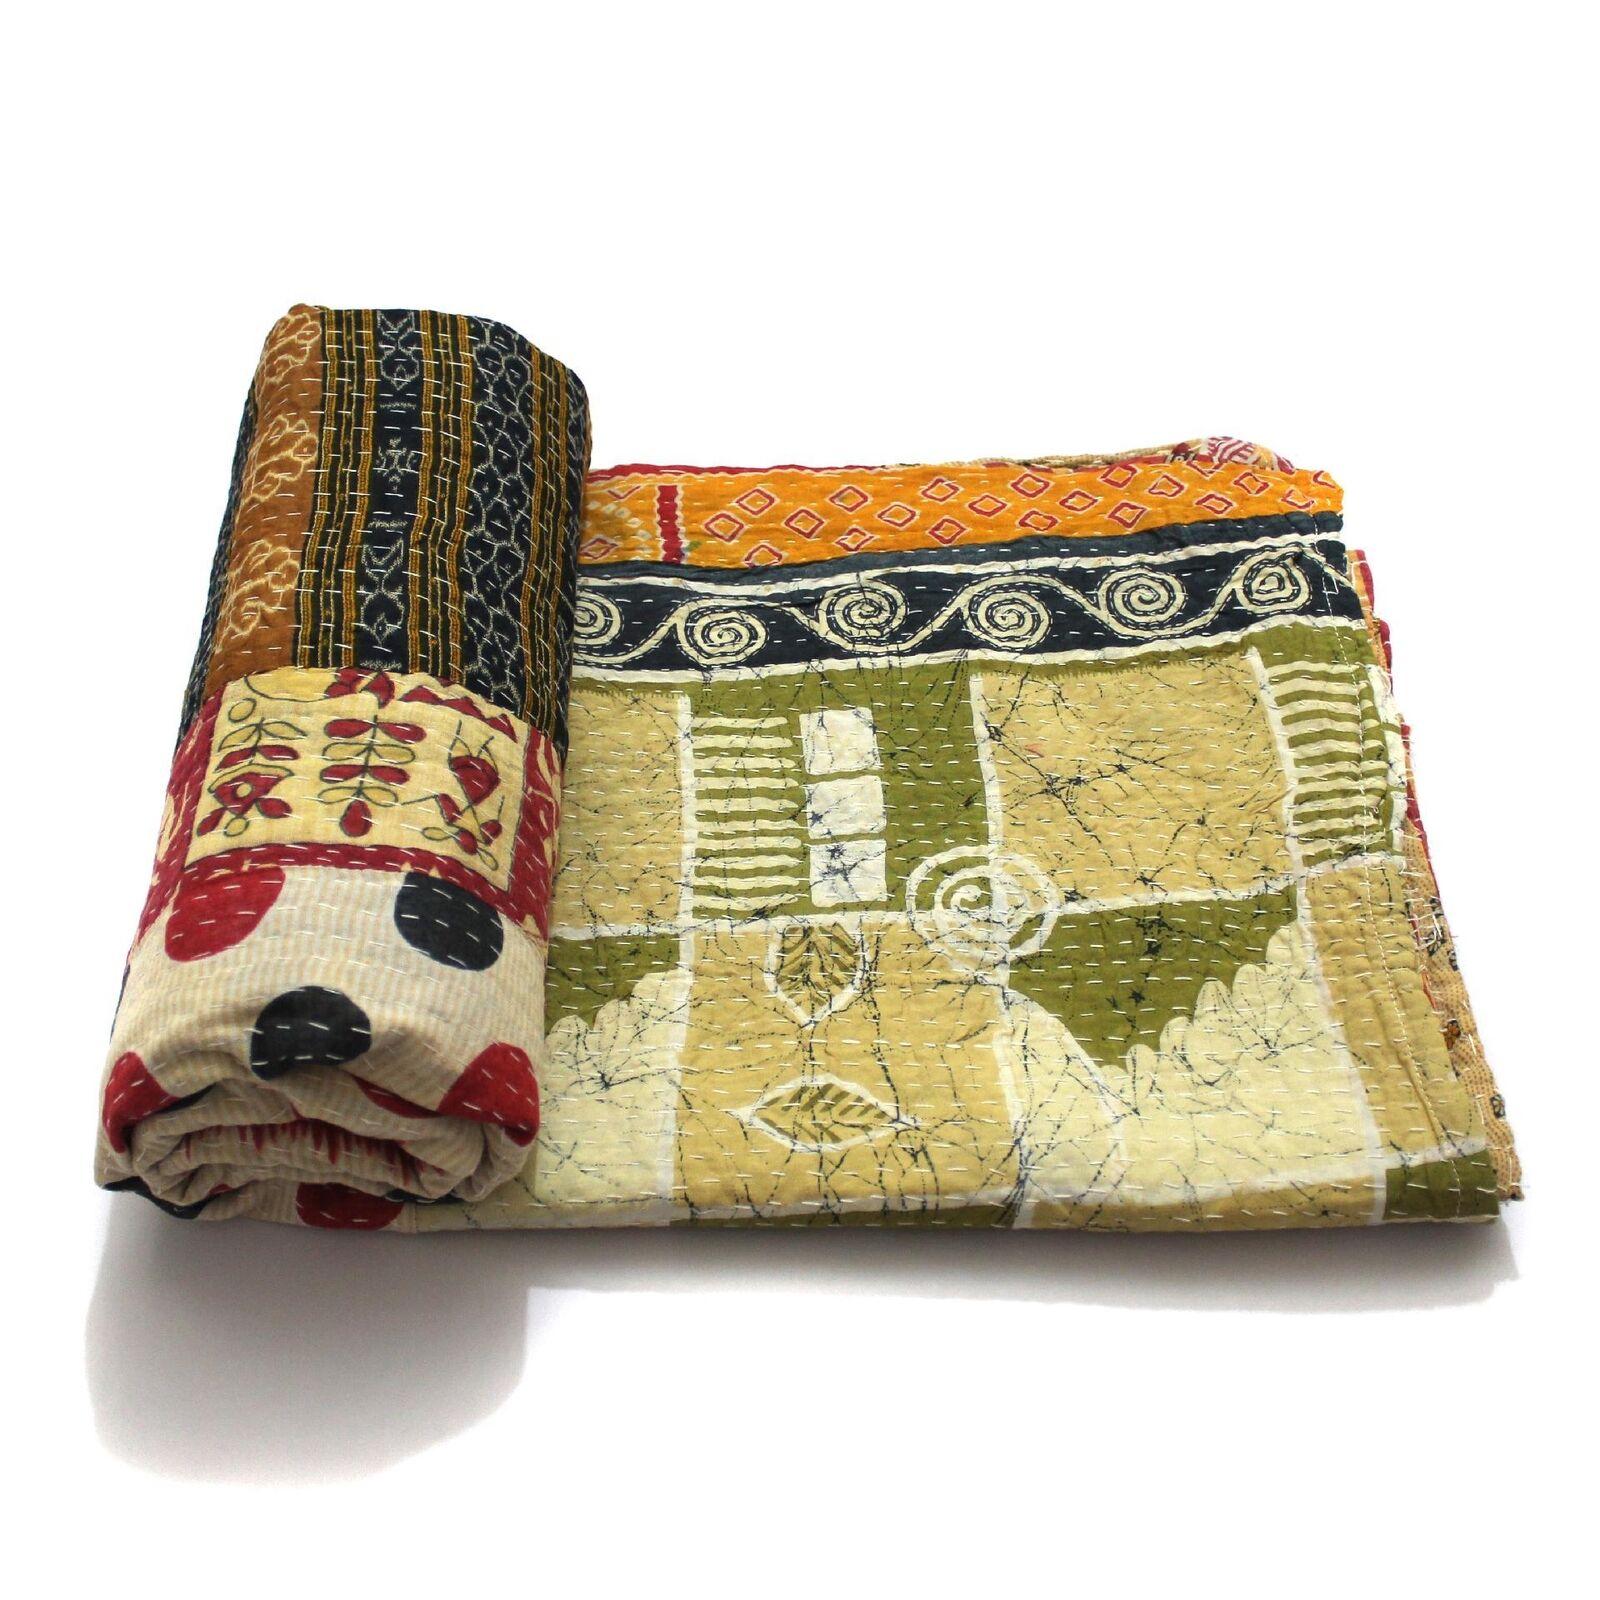 Vintage Kantha Quilt Indian Handmade Cotton Bedspread Art Decor Blanket Throw